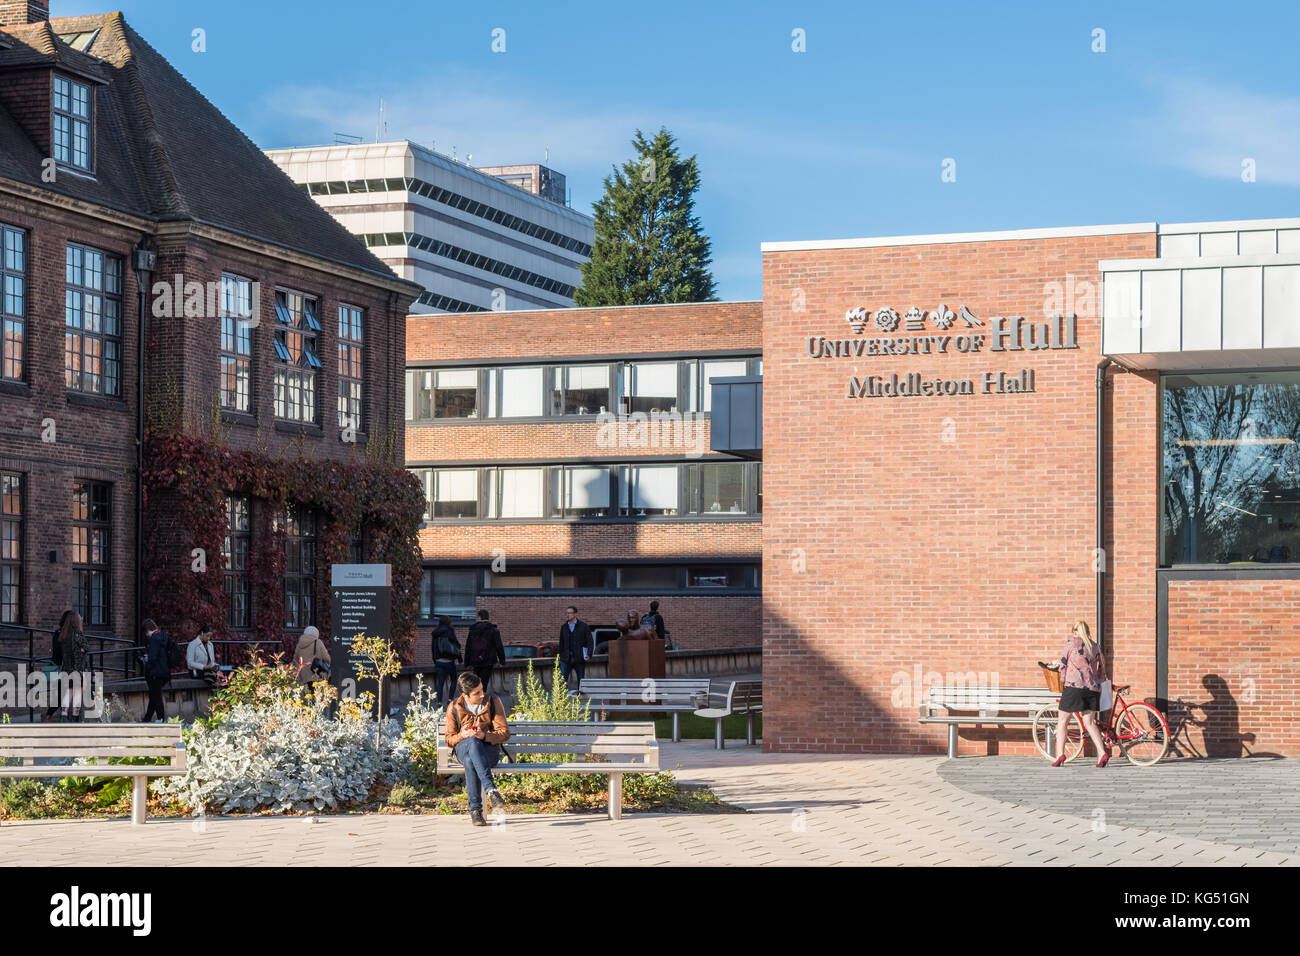 University of Hull, Kingston upon Hull, England,UK Stock Photo